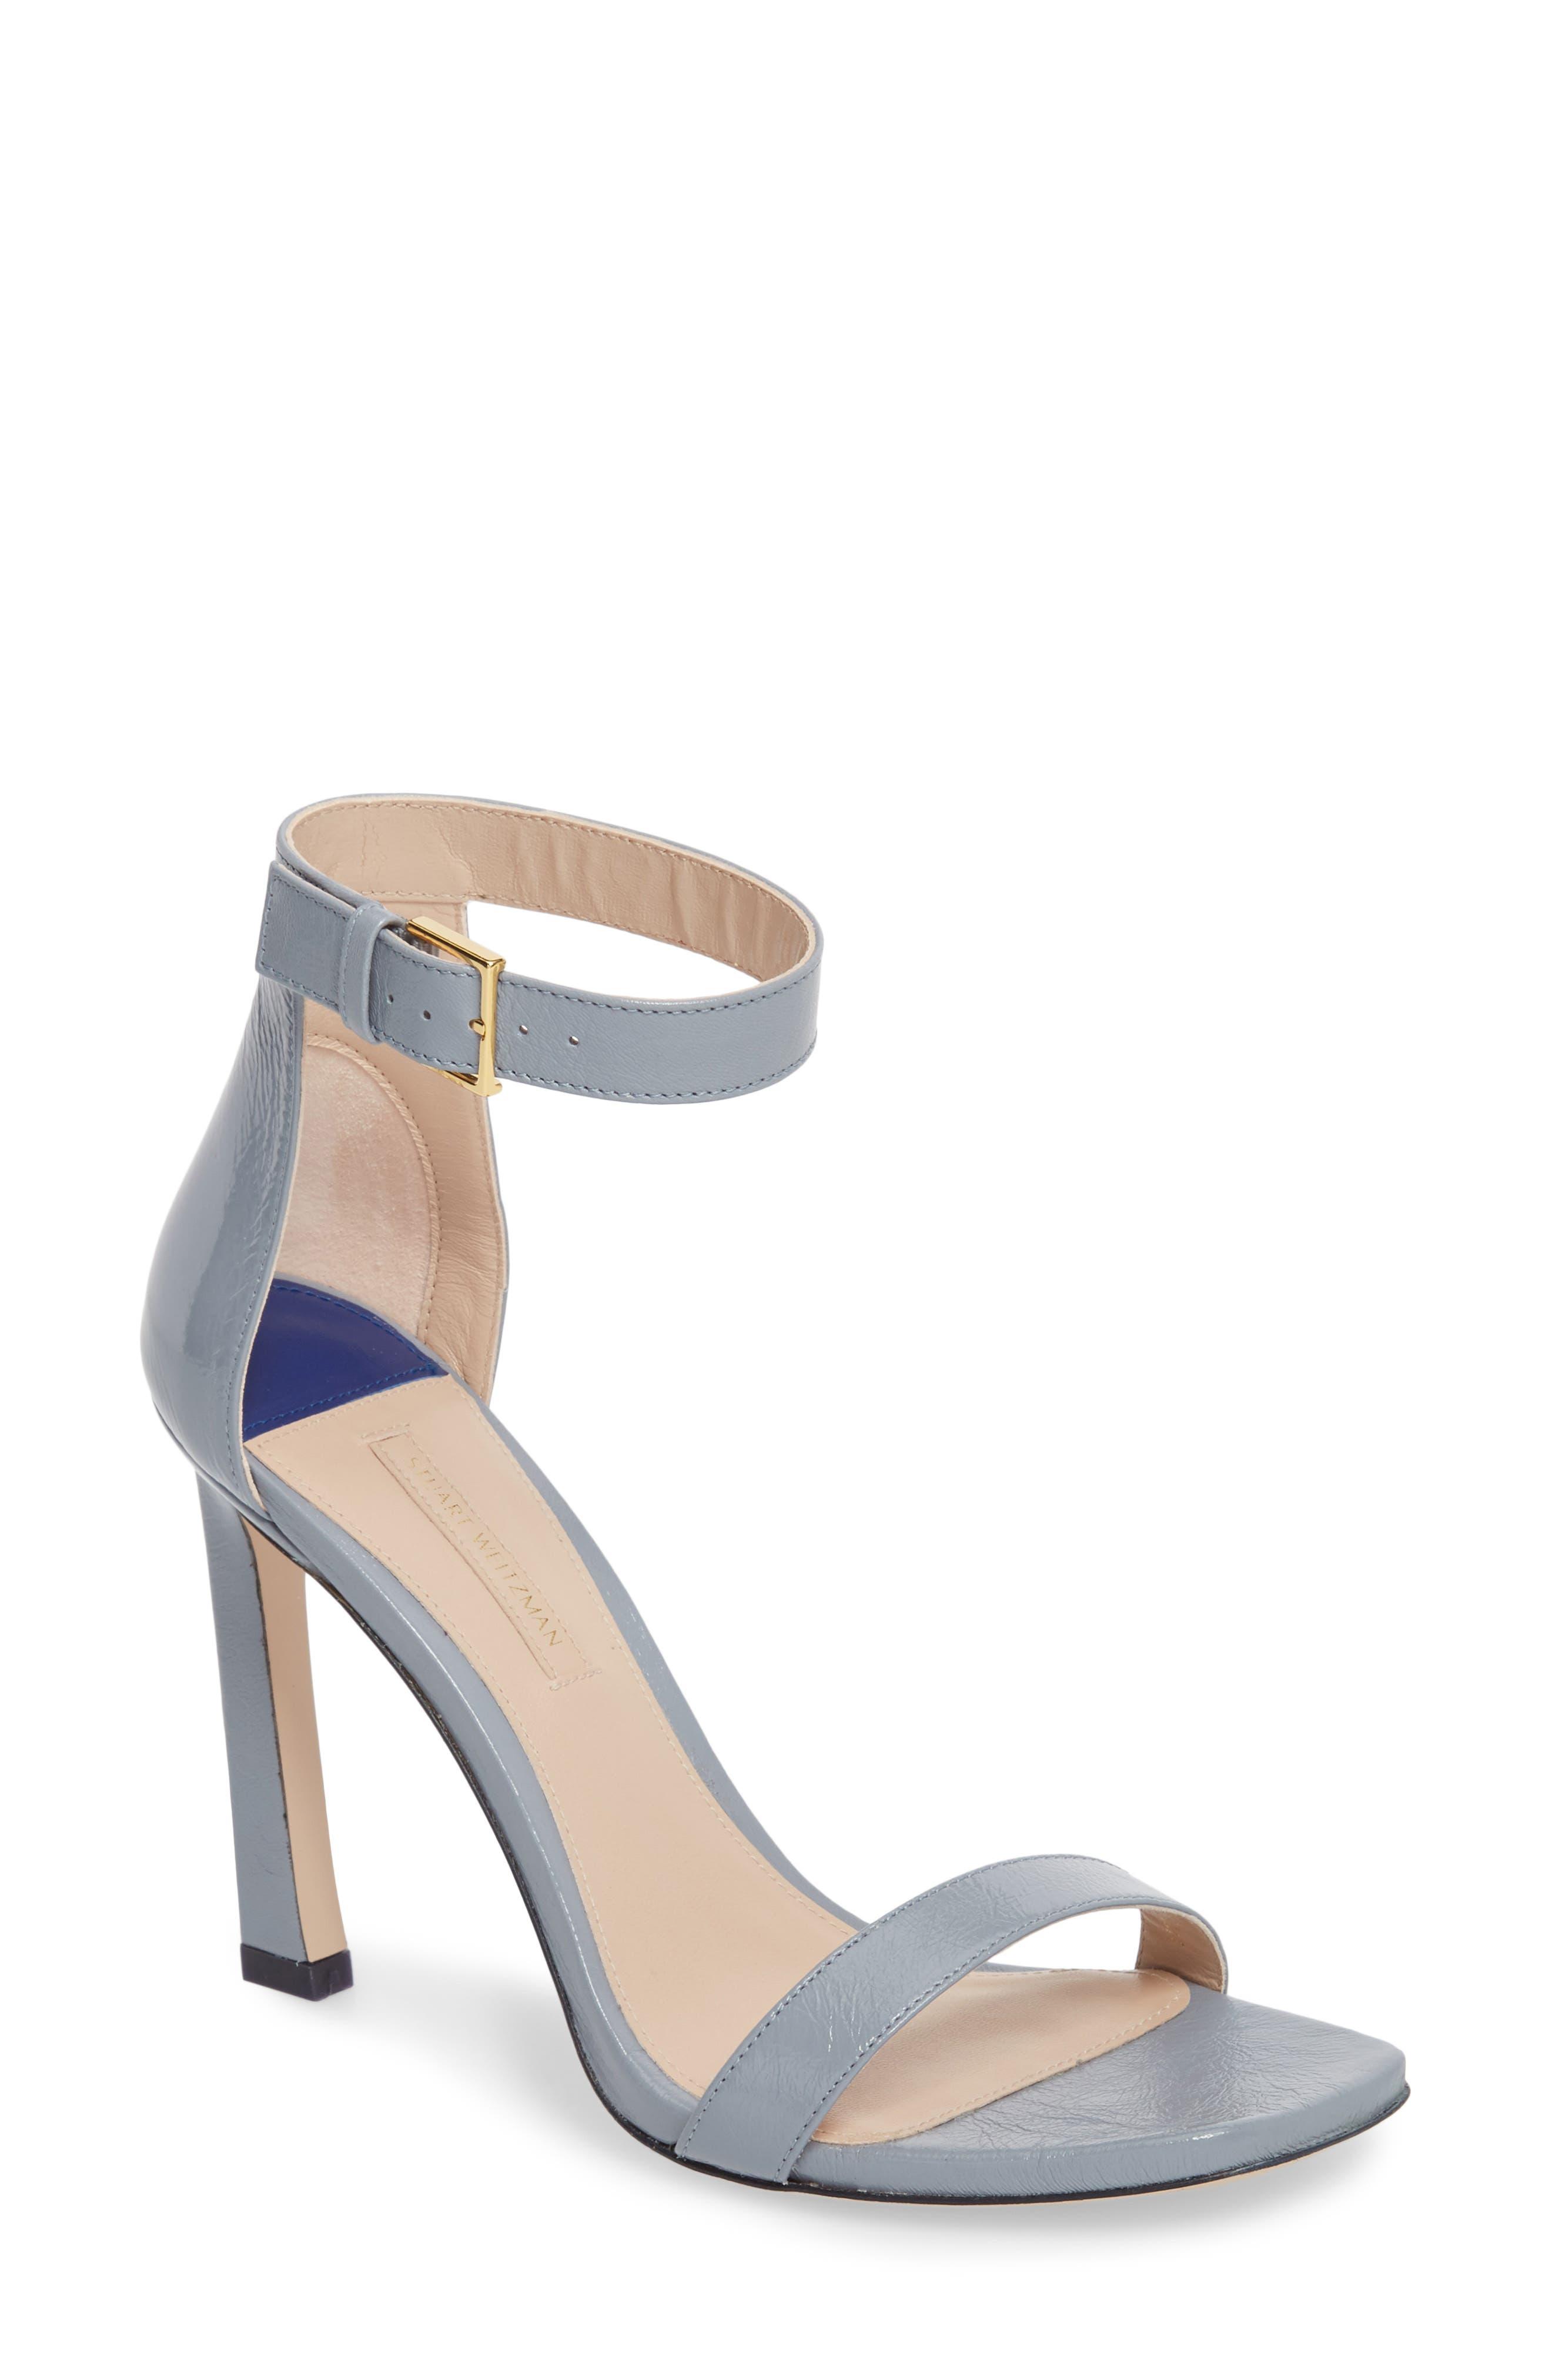 100SQUARENUDIST Sandal,                             Main thumbnail 1, color,                             Dovetail Gleaming Tripon